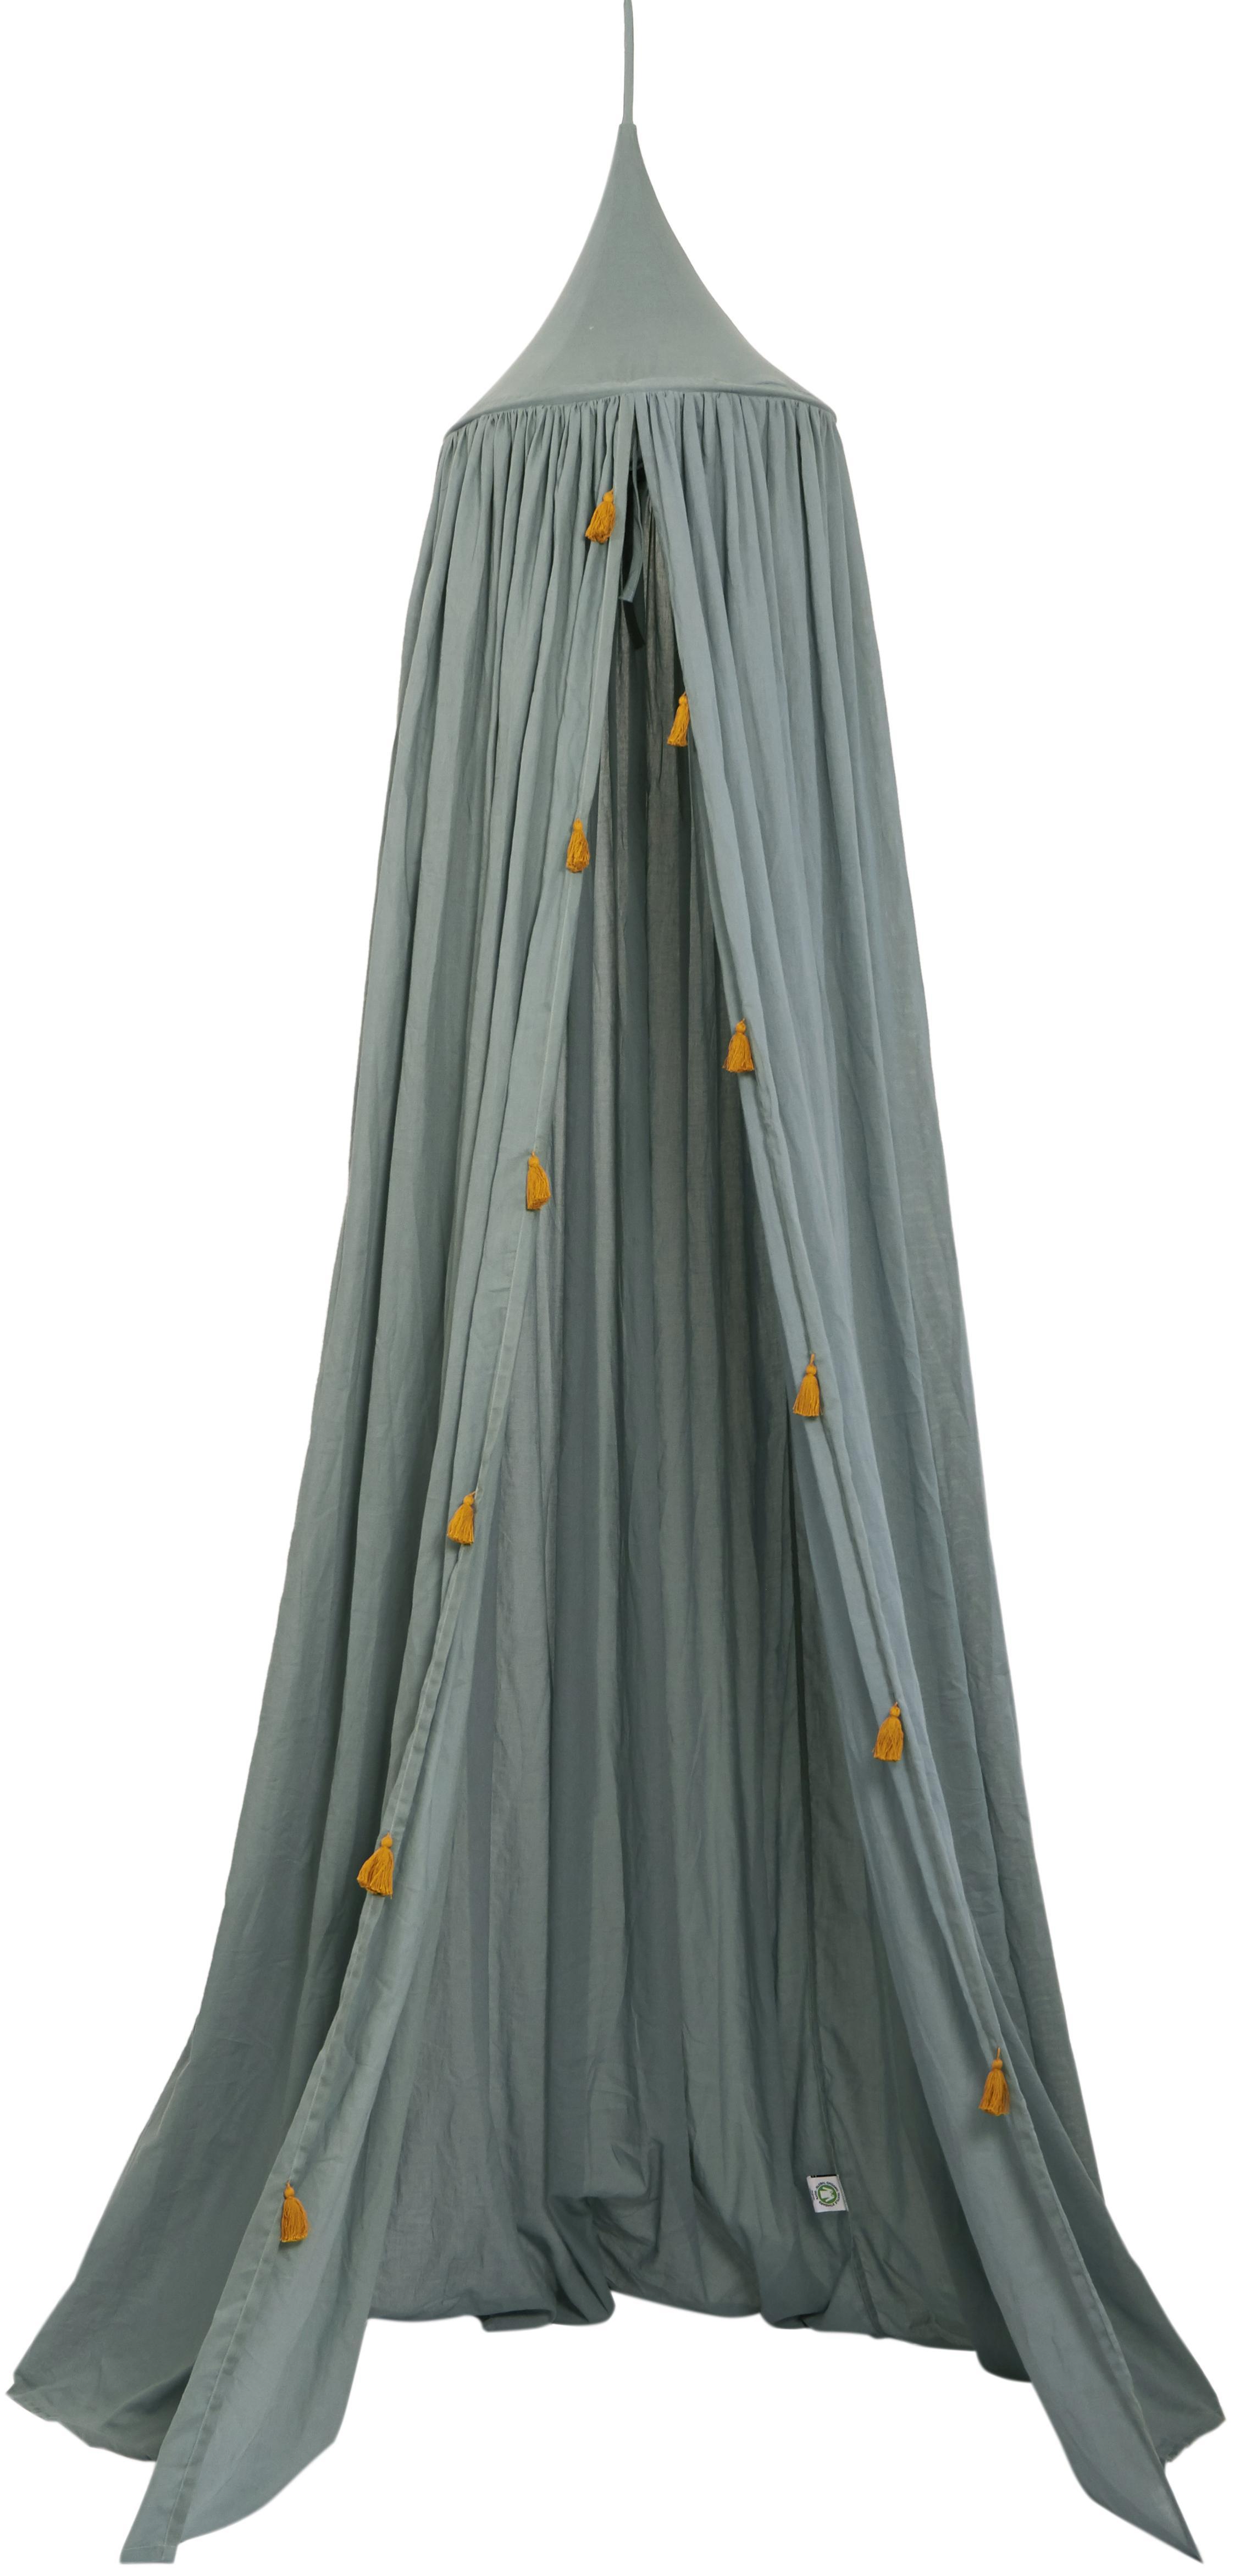 Klamboe Canopy, Biokatoen, Grijsgroen, goudkleurig, Ø 40 x H 200 cm